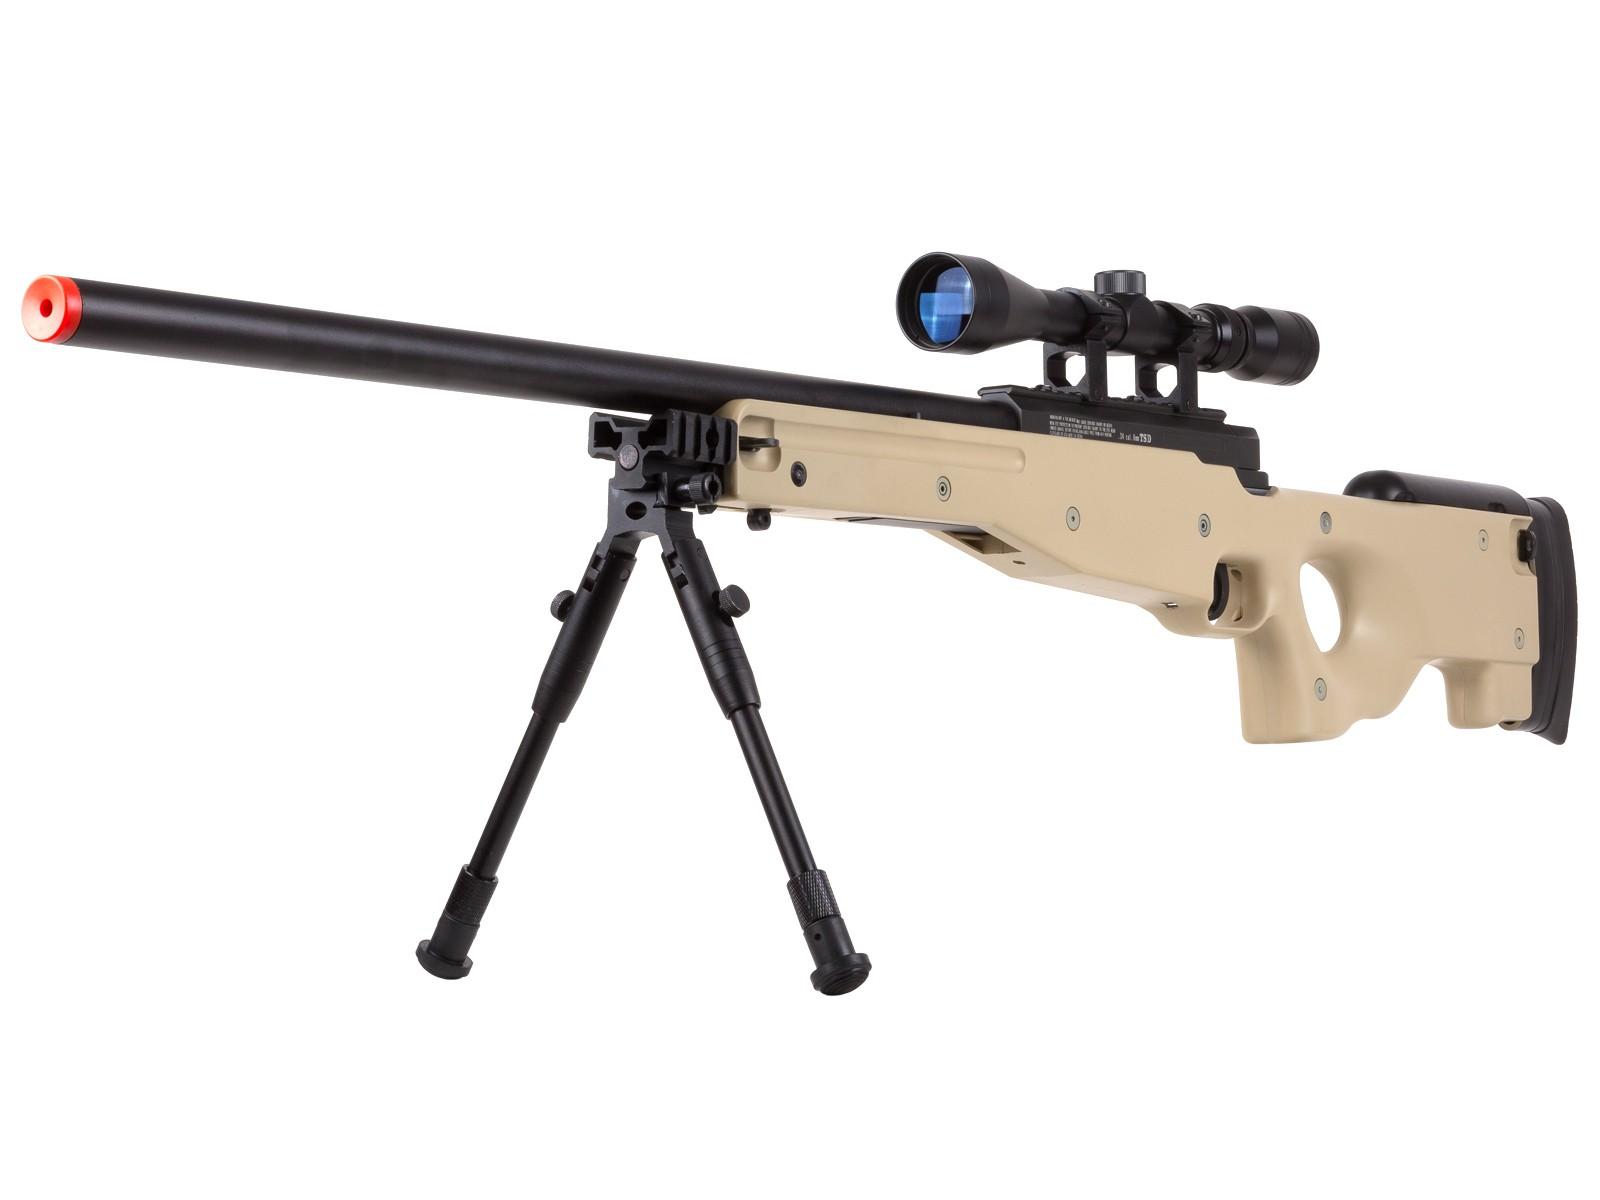 TSD_Tactical_Series_Type_96_Sniper_Tan_Rifle_6mm